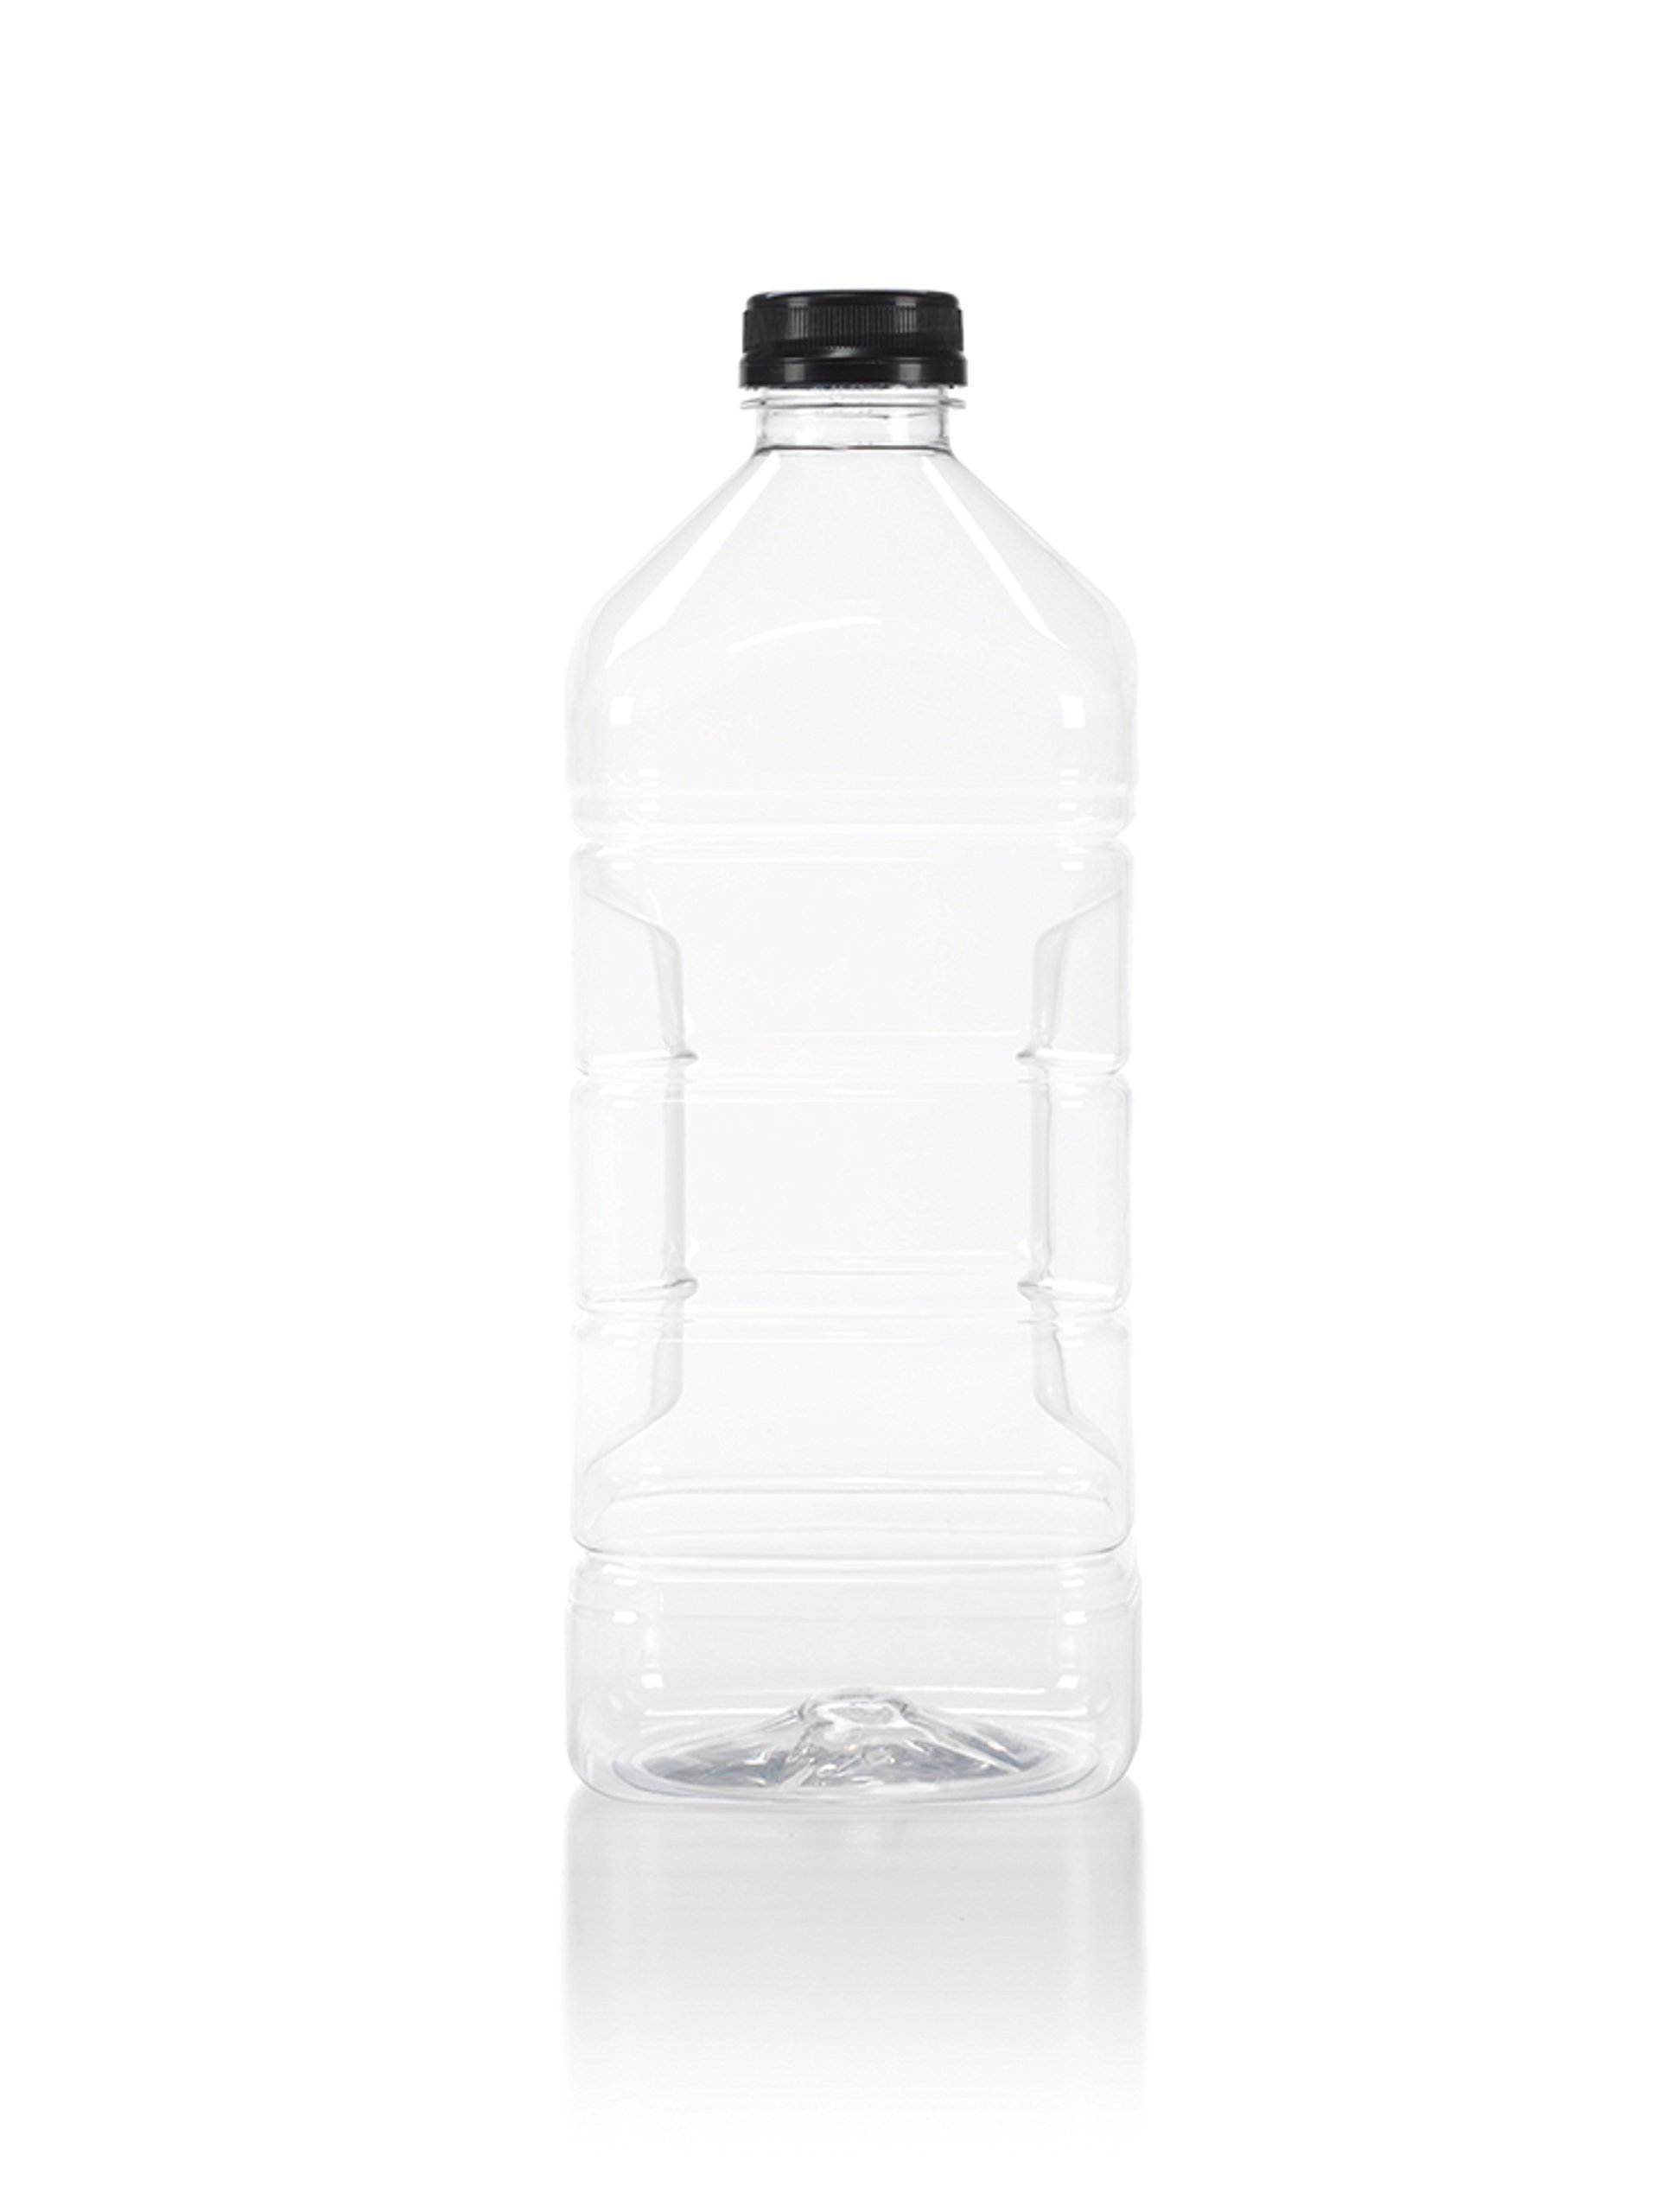 (6) 64 oz. Clear Food Grade Plastic Juice Bottles with Tamper Evident Black Caps 6/pack (64 oz, Black Lid) by Juce Jugz